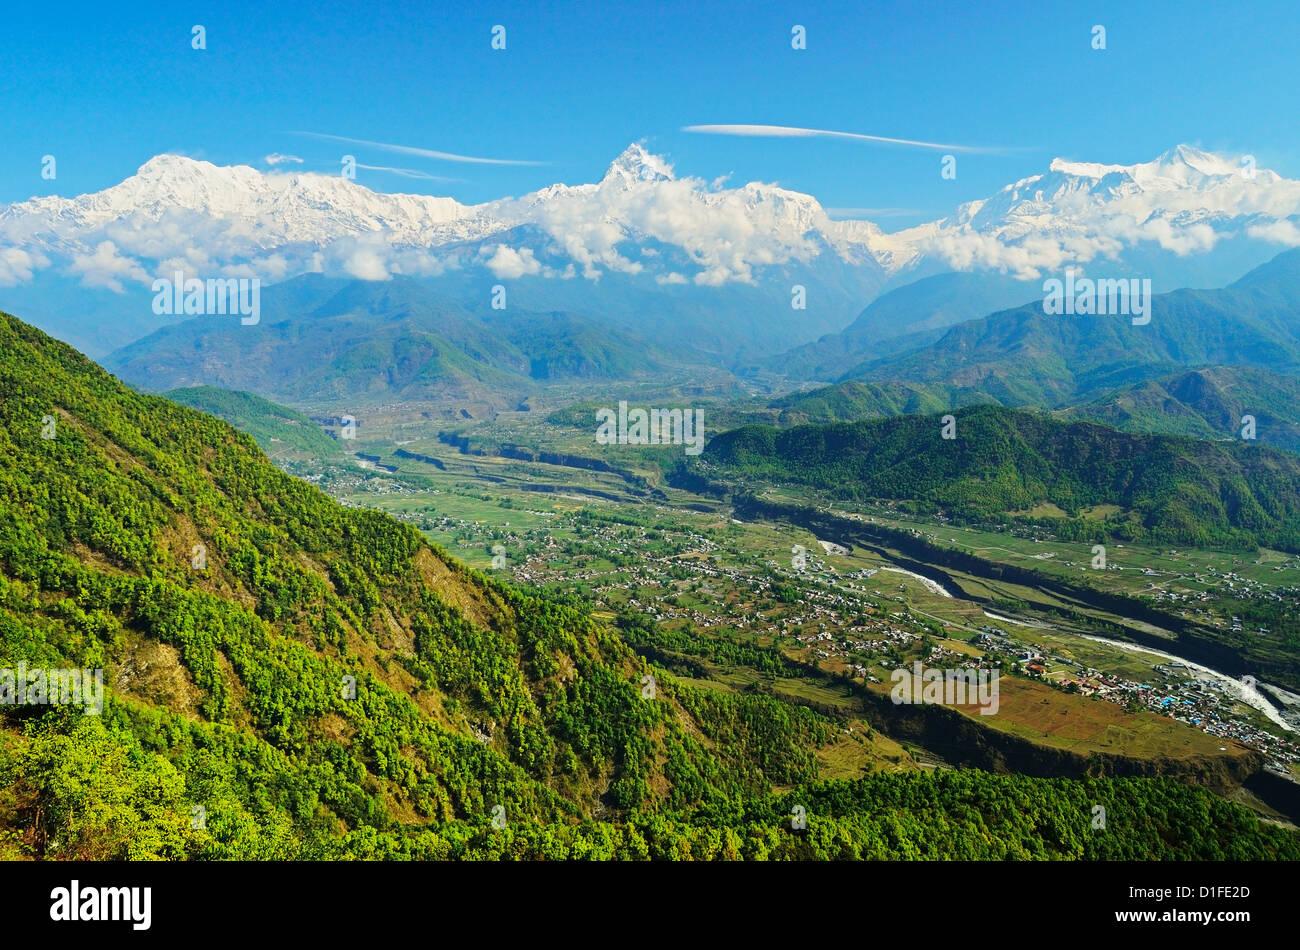 Annapurna Himal and Machapuchare seen from Sarangkot, Gandaki Zone, Western Region, Nepal, Himalayas, Asia - Stock Image